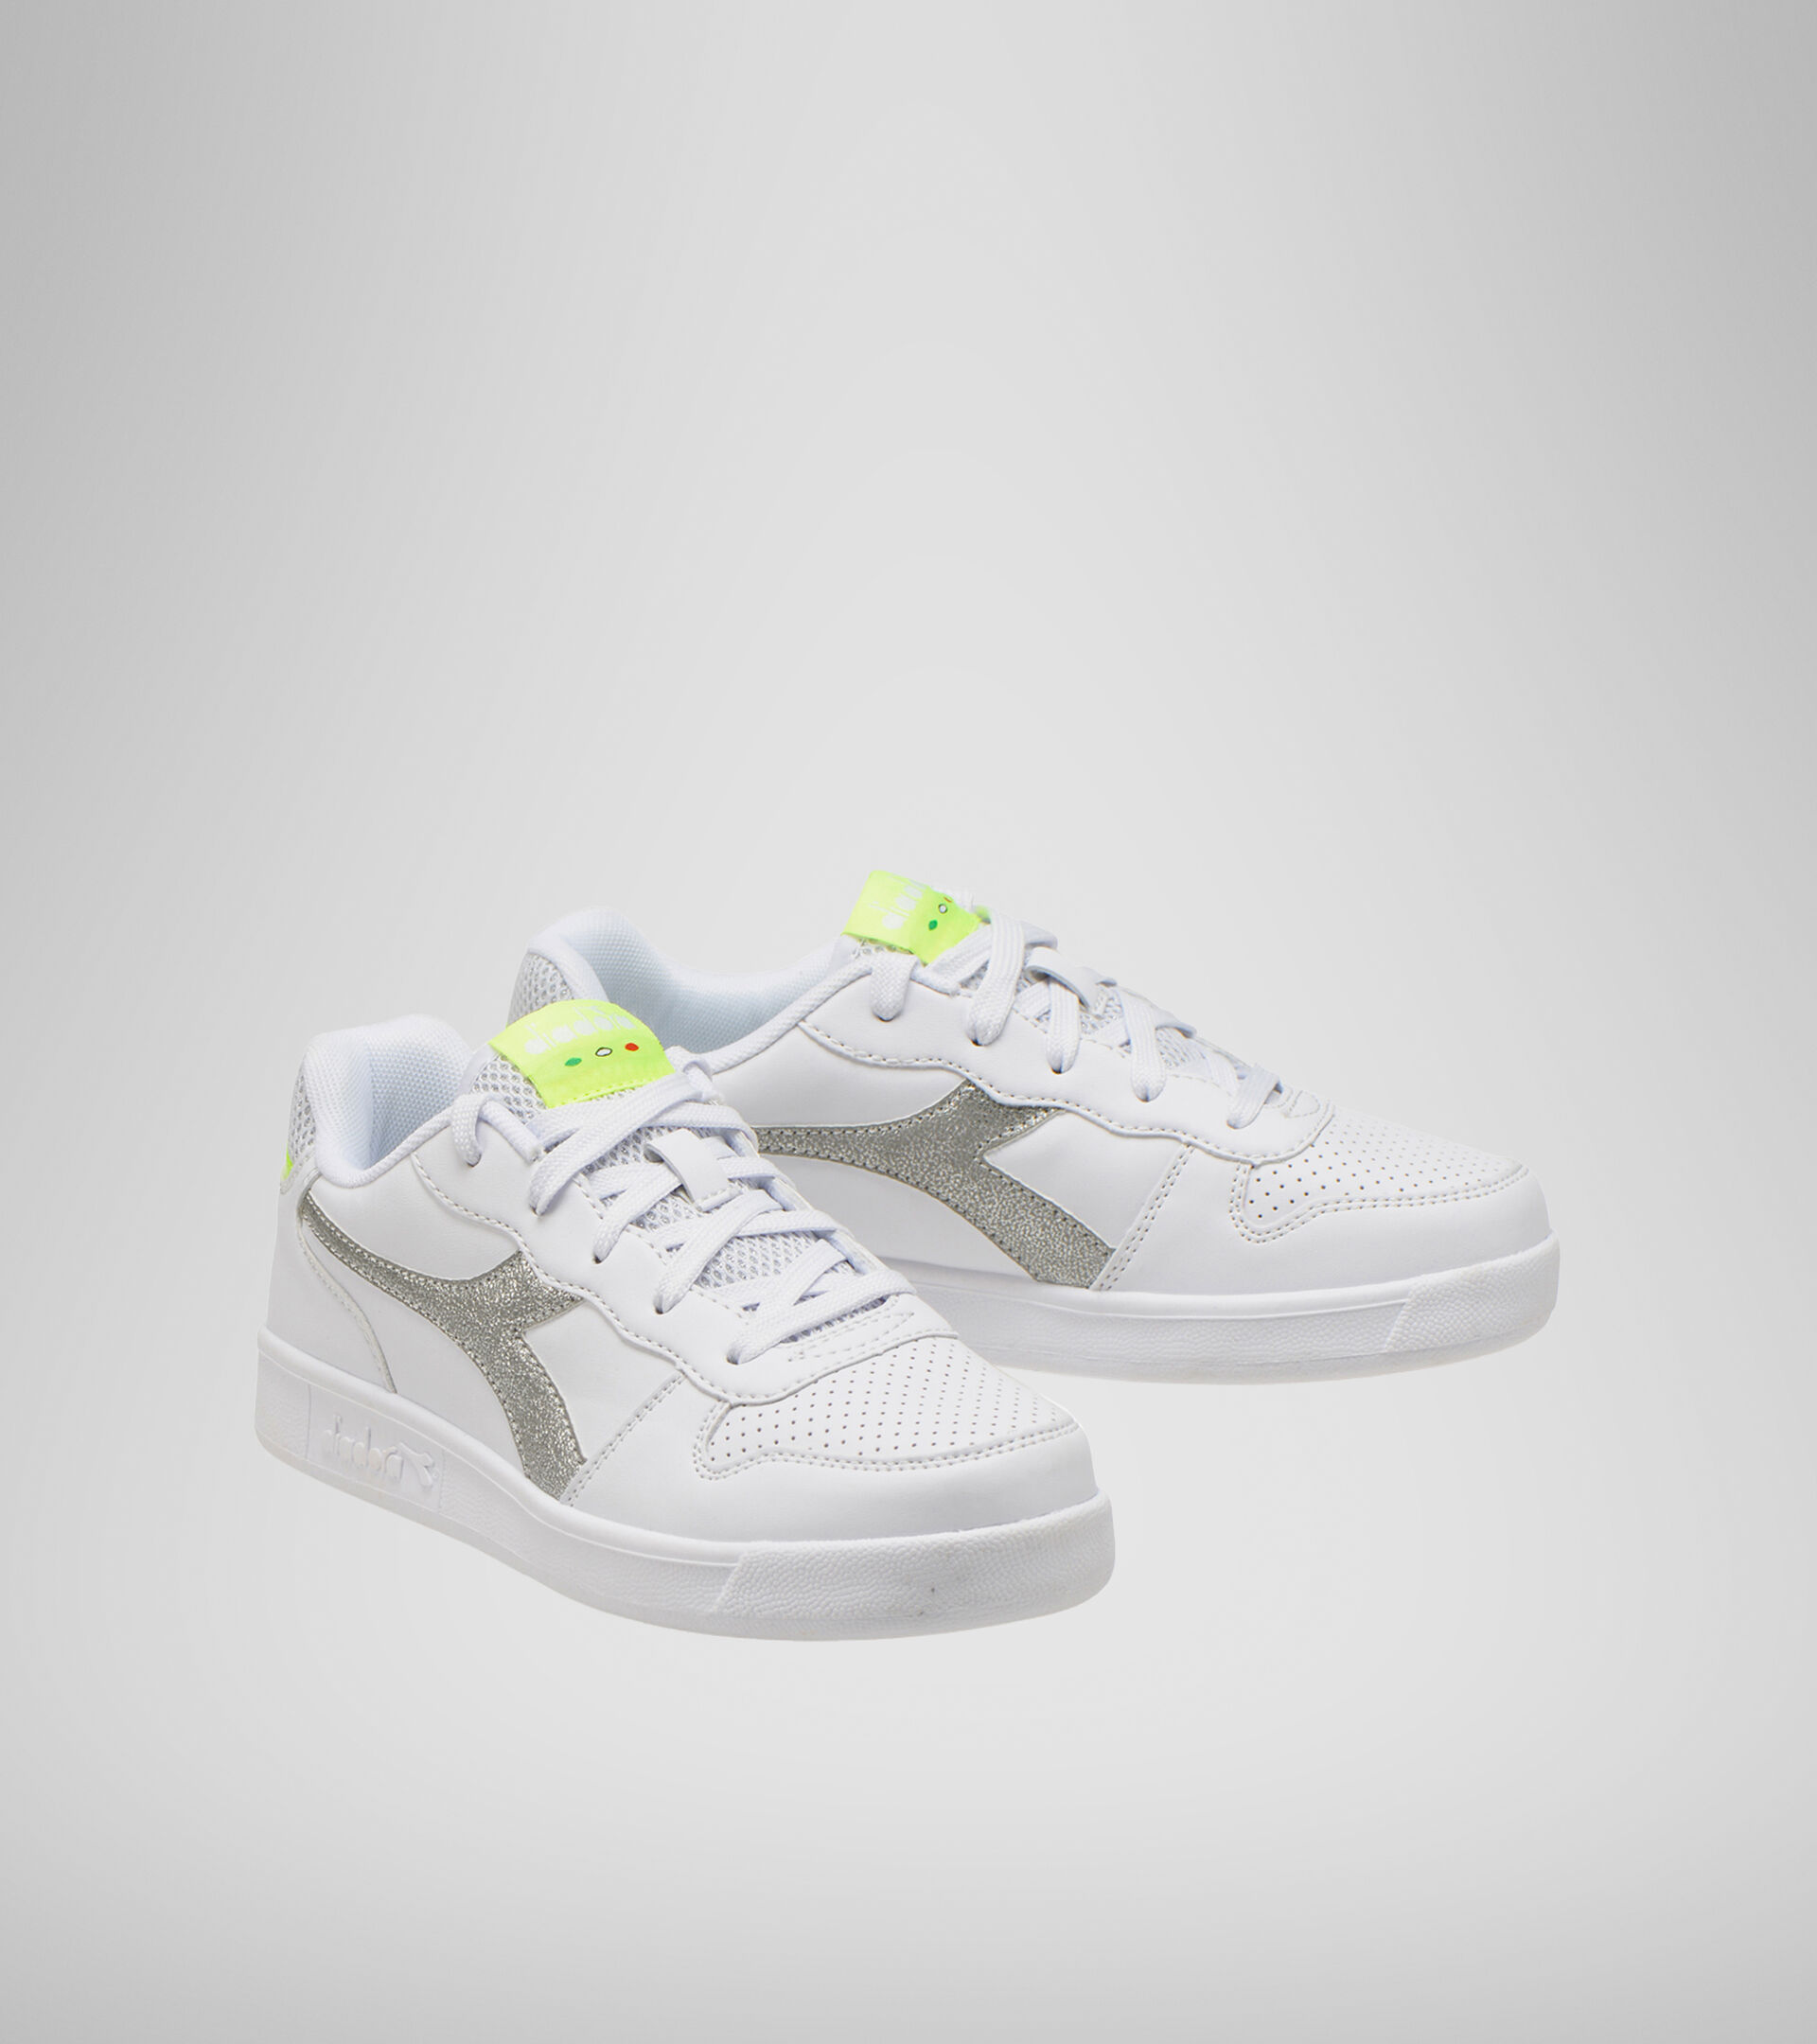 Footwear Sport BAMBINO PLAYGROUND GS GIRL WHITE/YELLOW FLUO. Diadora